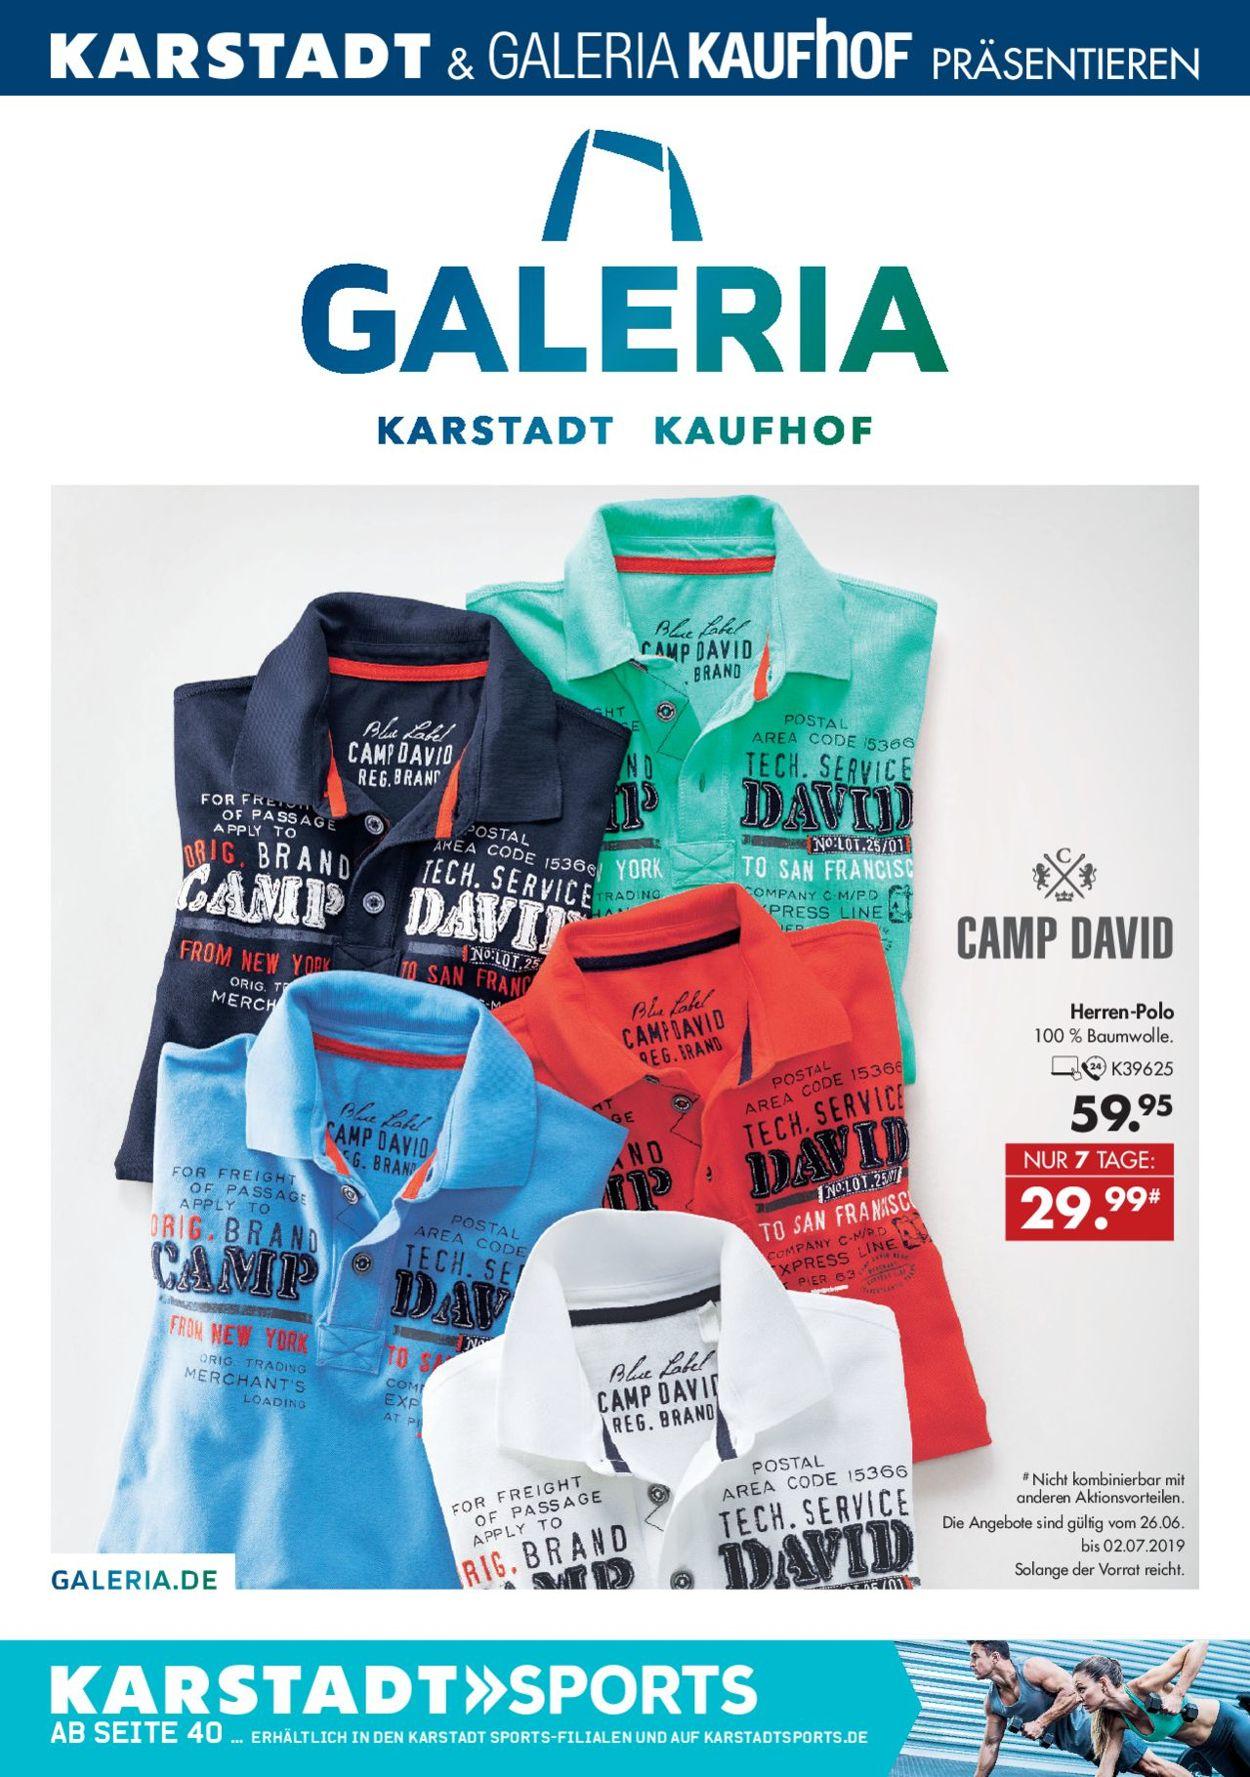 fashion styles hot products promo code Karstadt Aktueller Prospekt 26.06 - 02.07.2019 - jedewoche ...